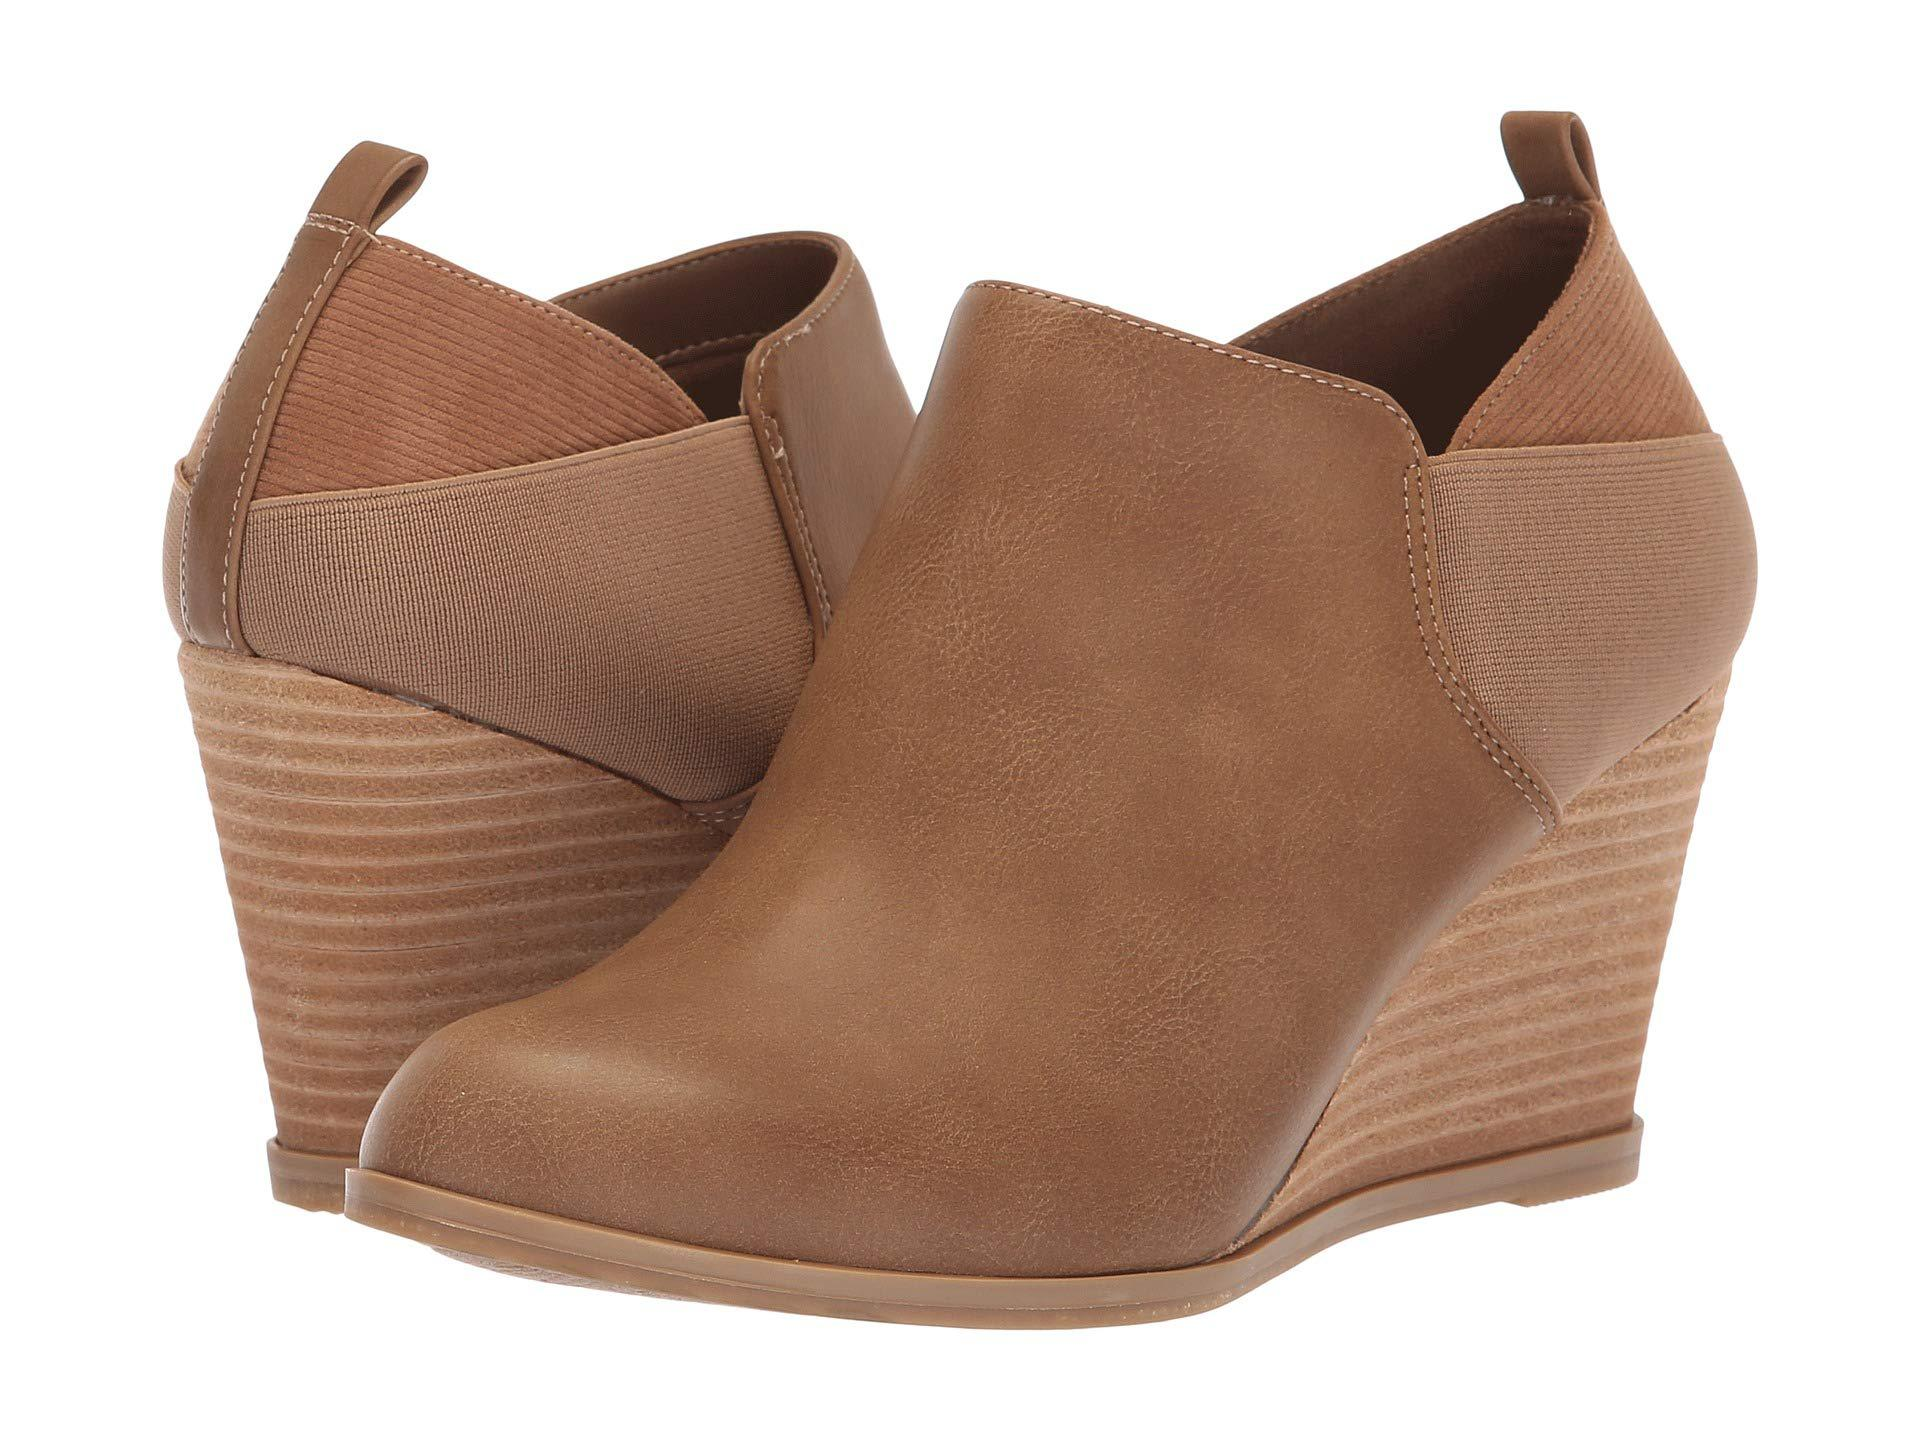 763f75d027d Lyst - Dr. Scholls Parler (beige Smooth) Women s Shoes